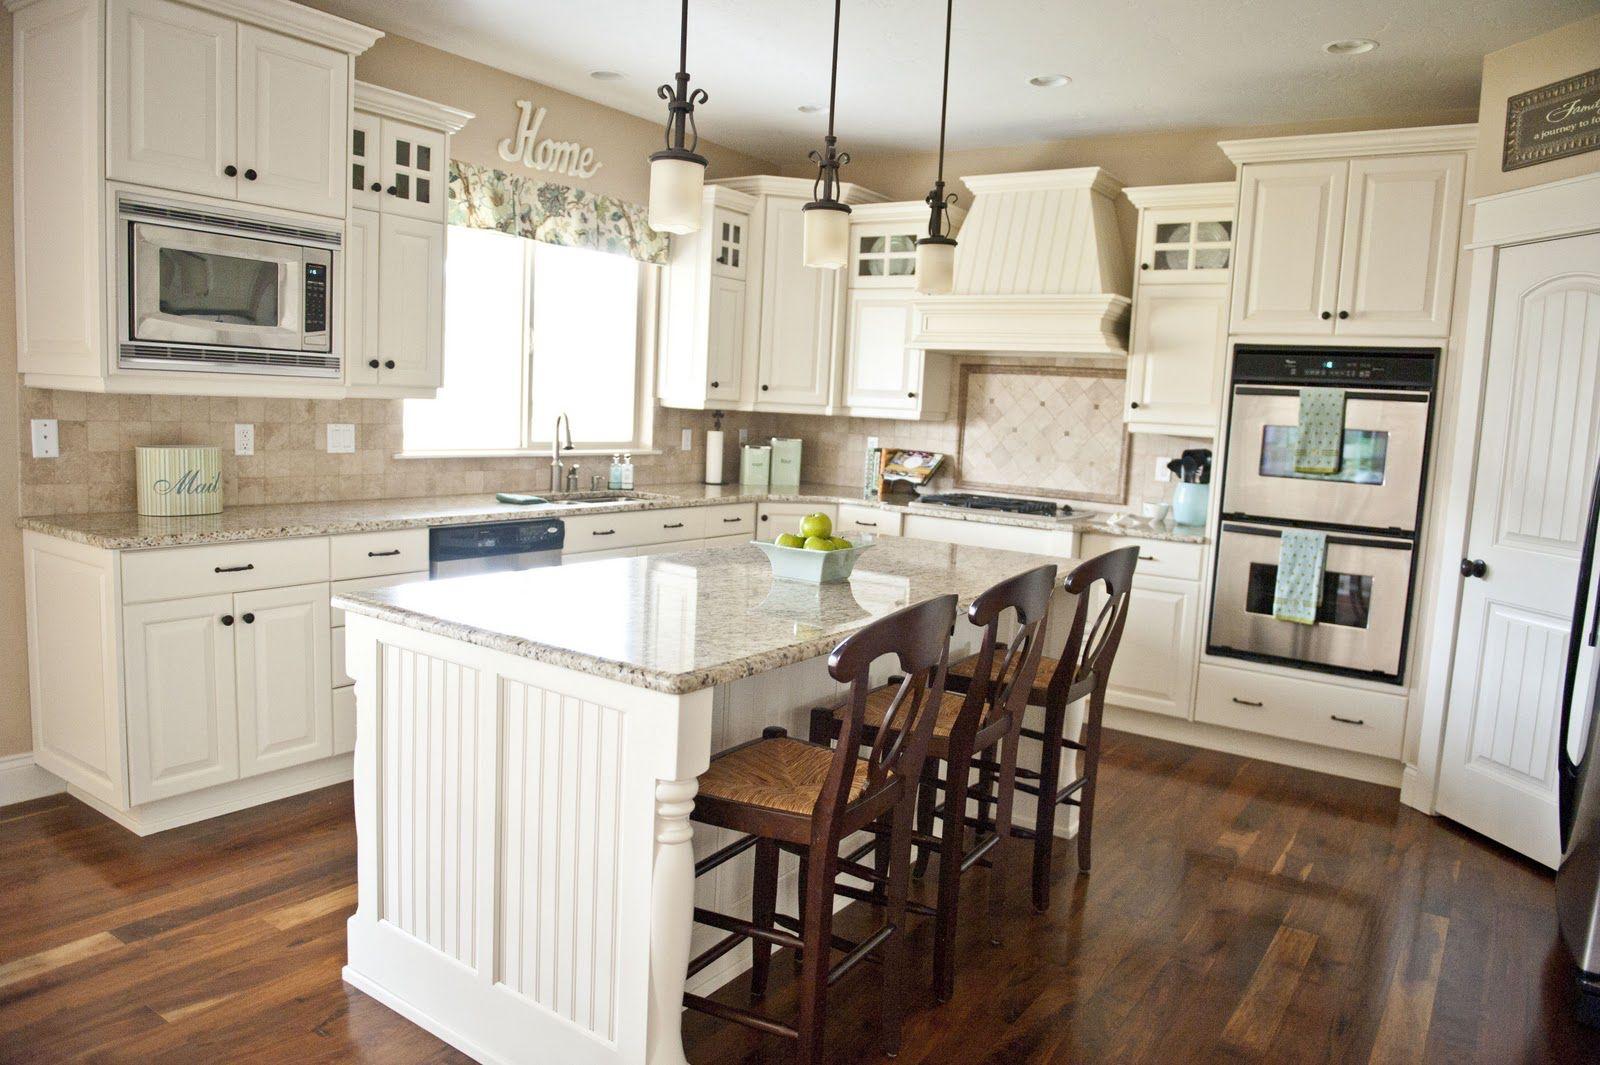 Image from http://3.bp.blogspot.com/-BV9zCmQSNqo/TtweThAmVWI/AAAAAAAABiI/dOb0KAm5j2k/s1600/kitchen+8.jpg.